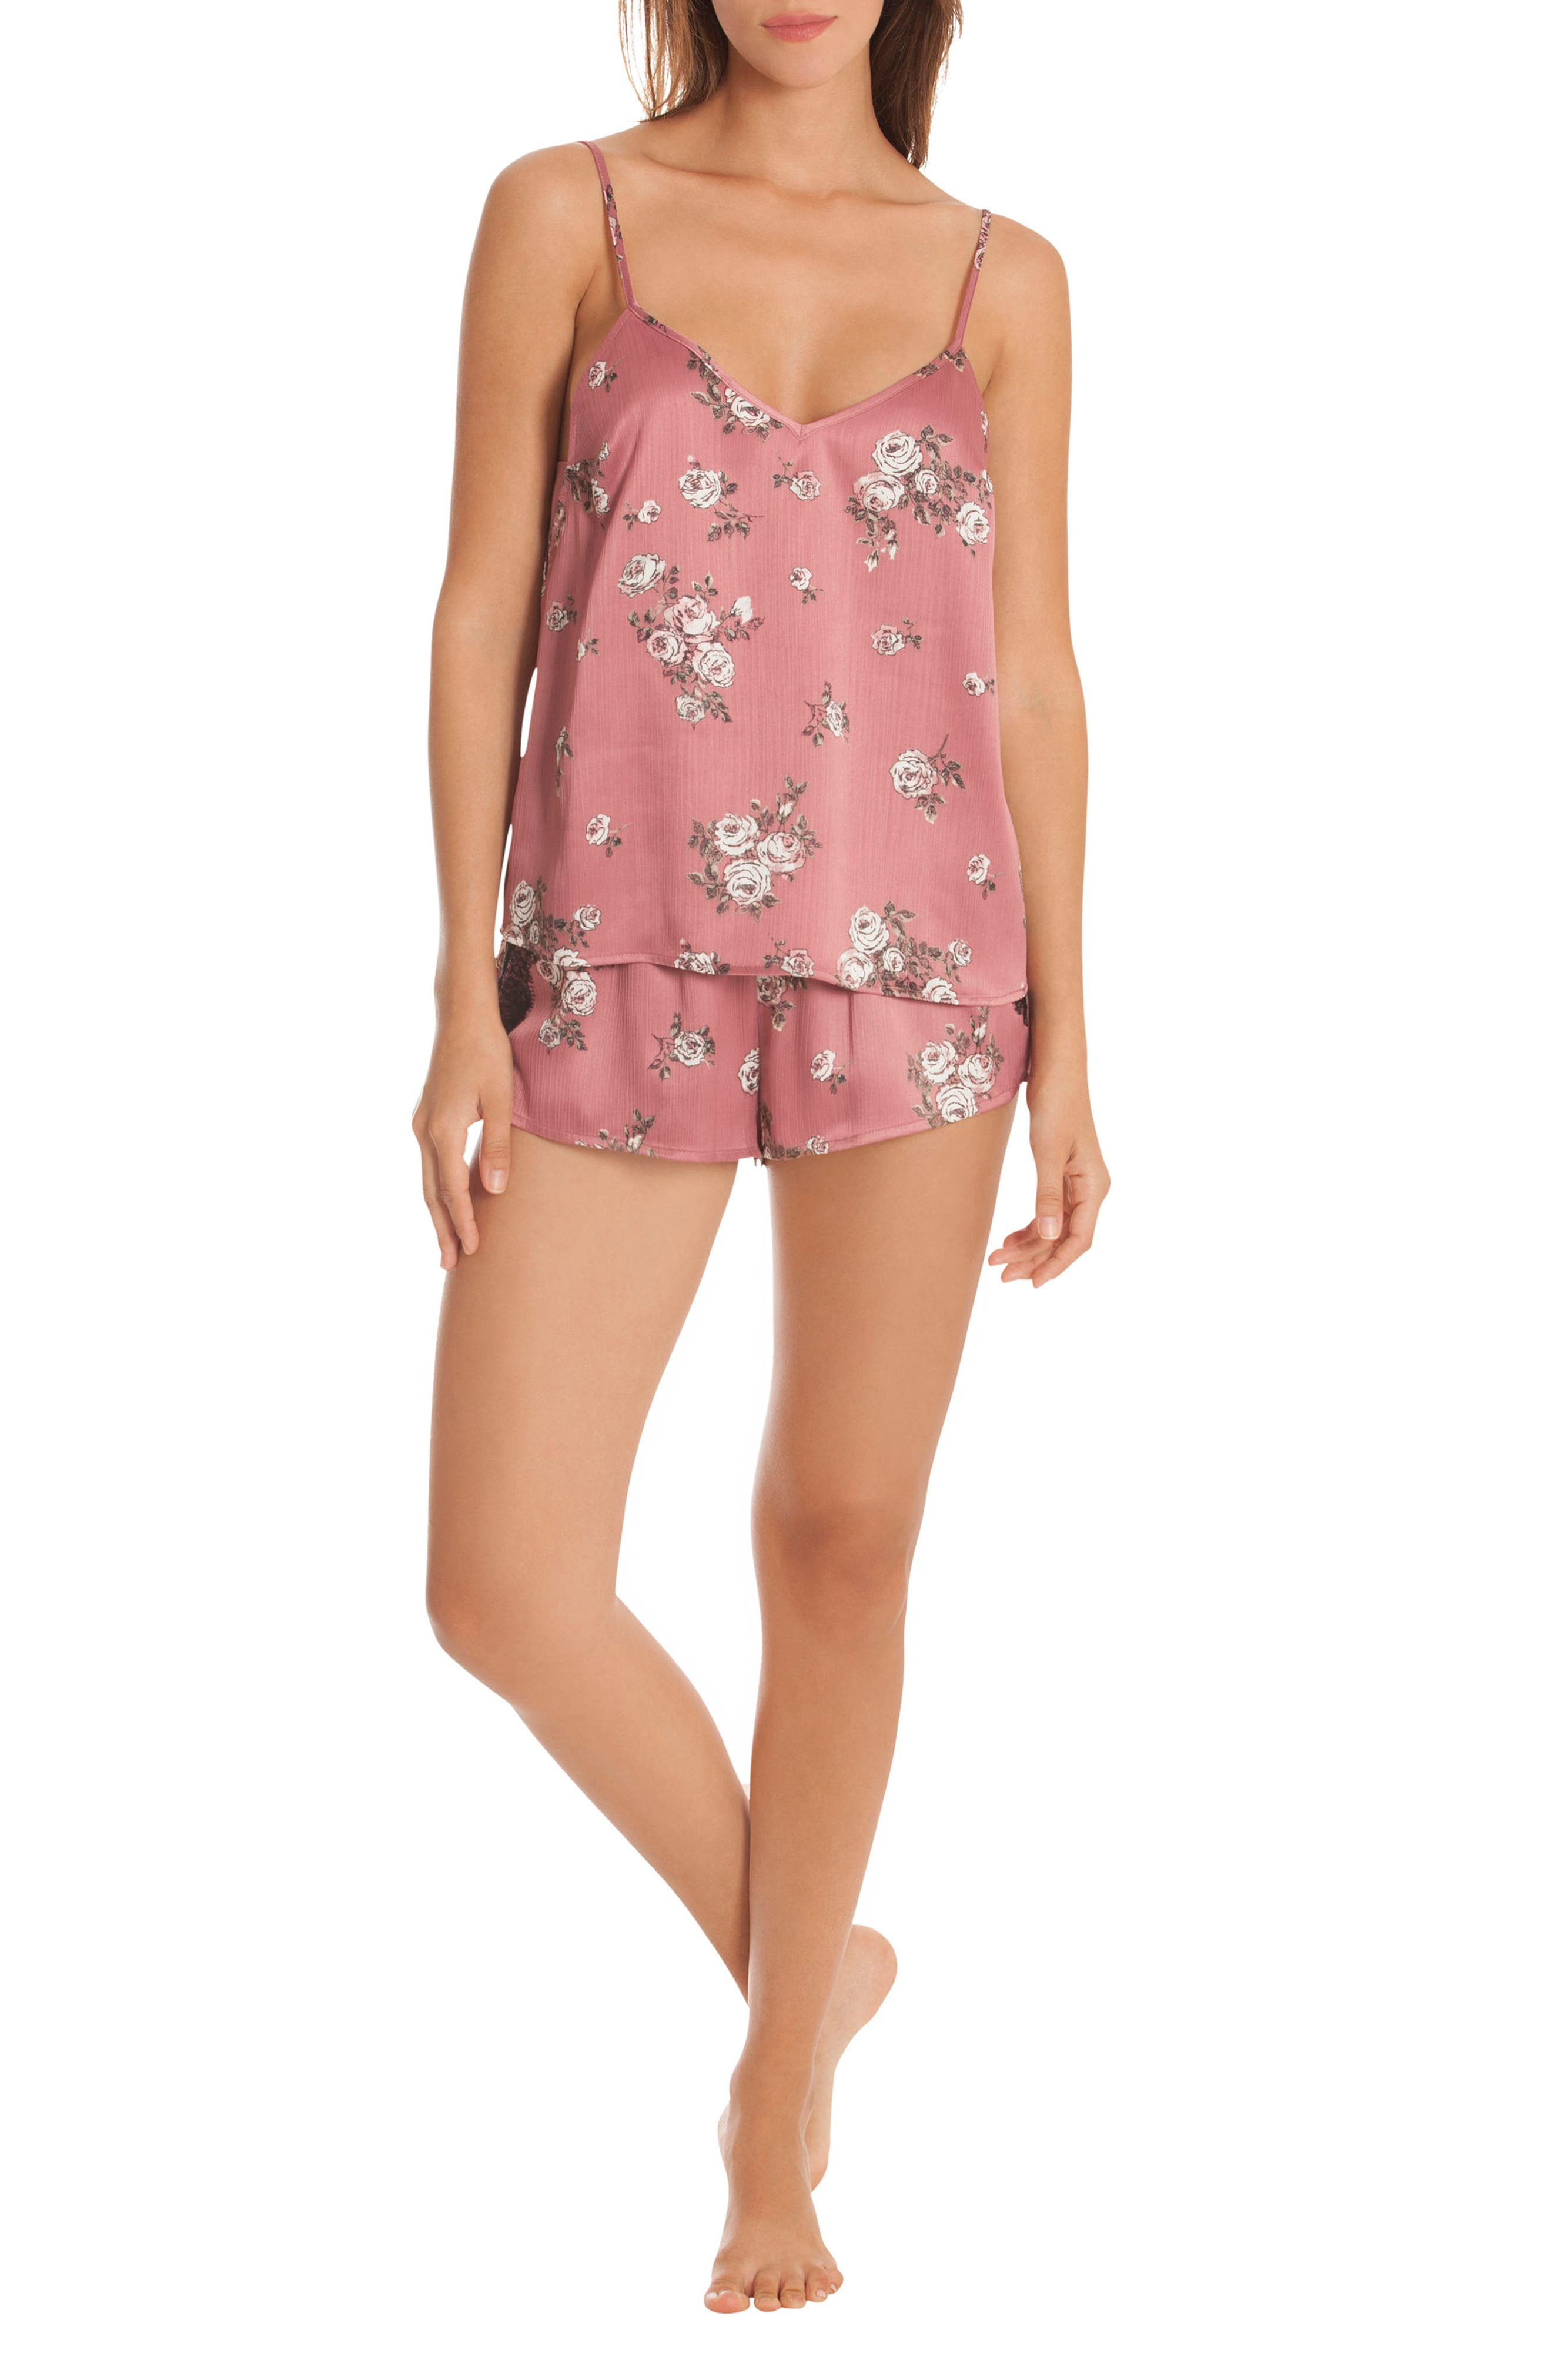 Tegan Short Pajamas,                             Alternate thumbnail 7, color,                             ROSE